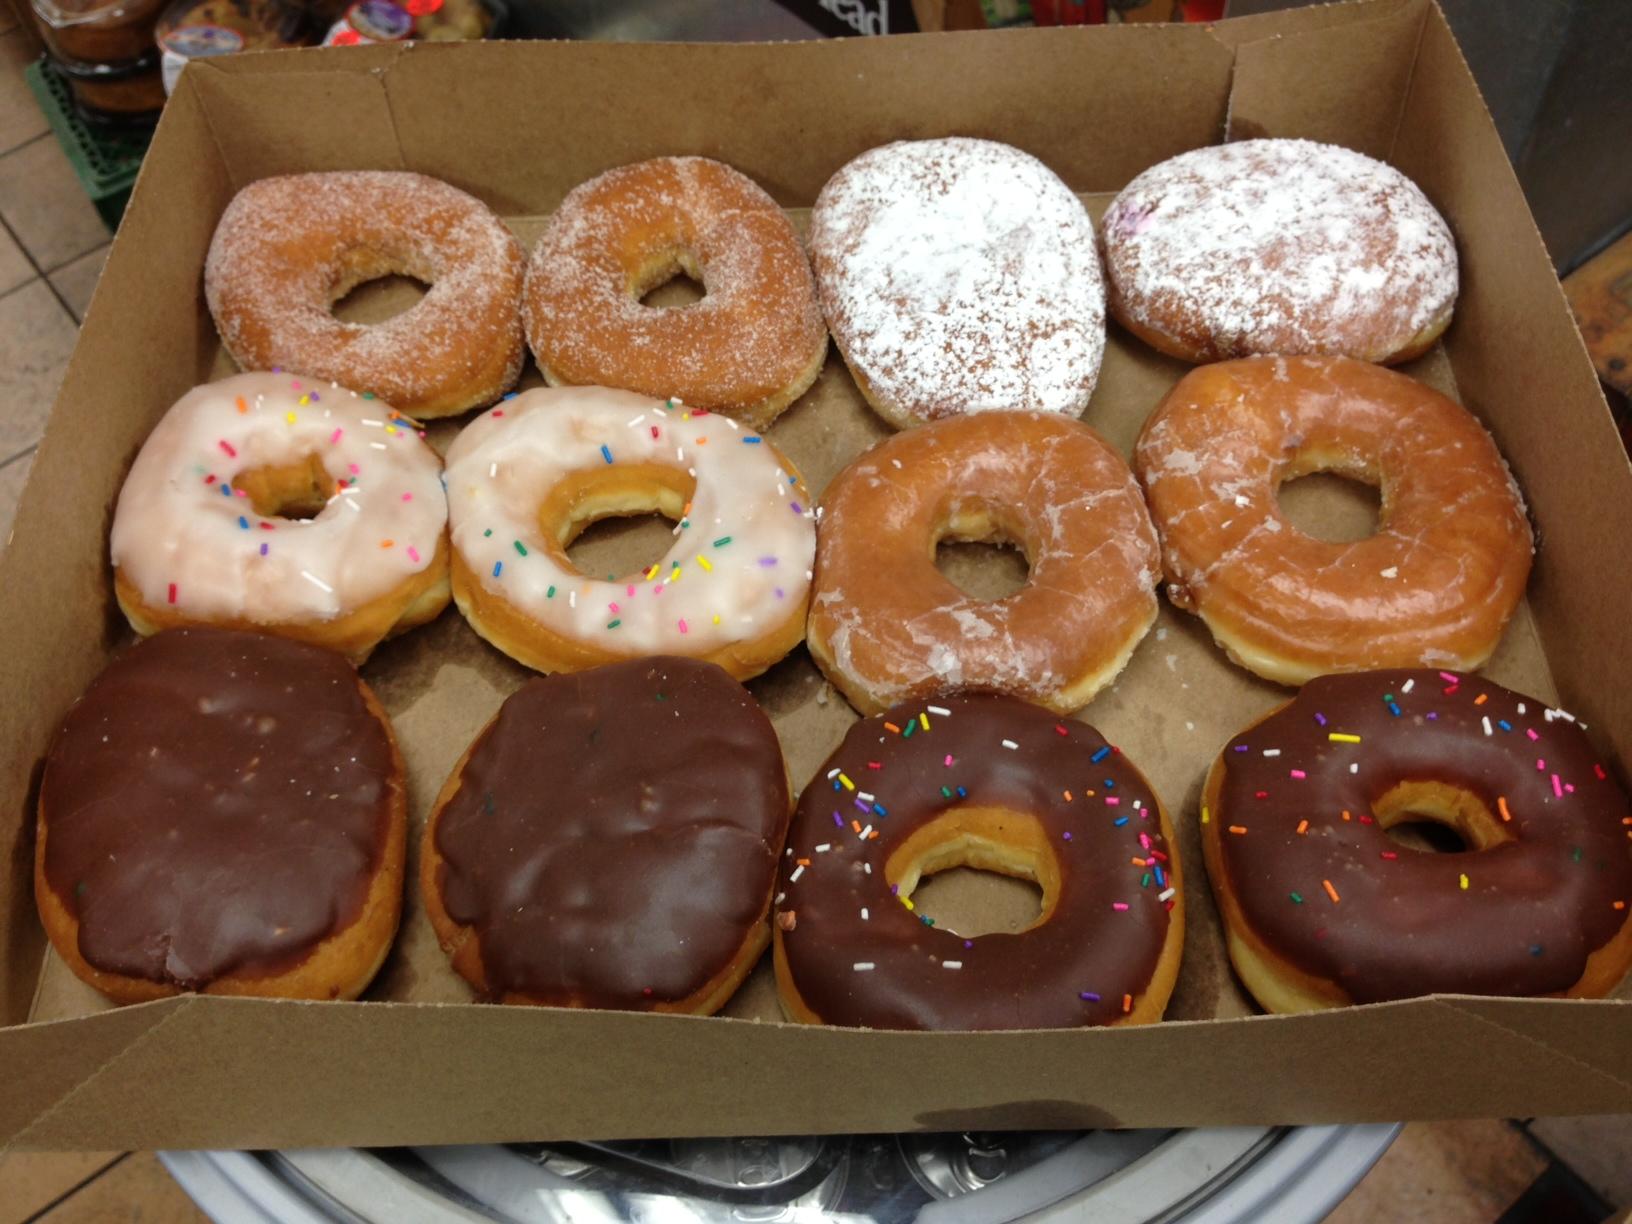 Snacks by the dozen